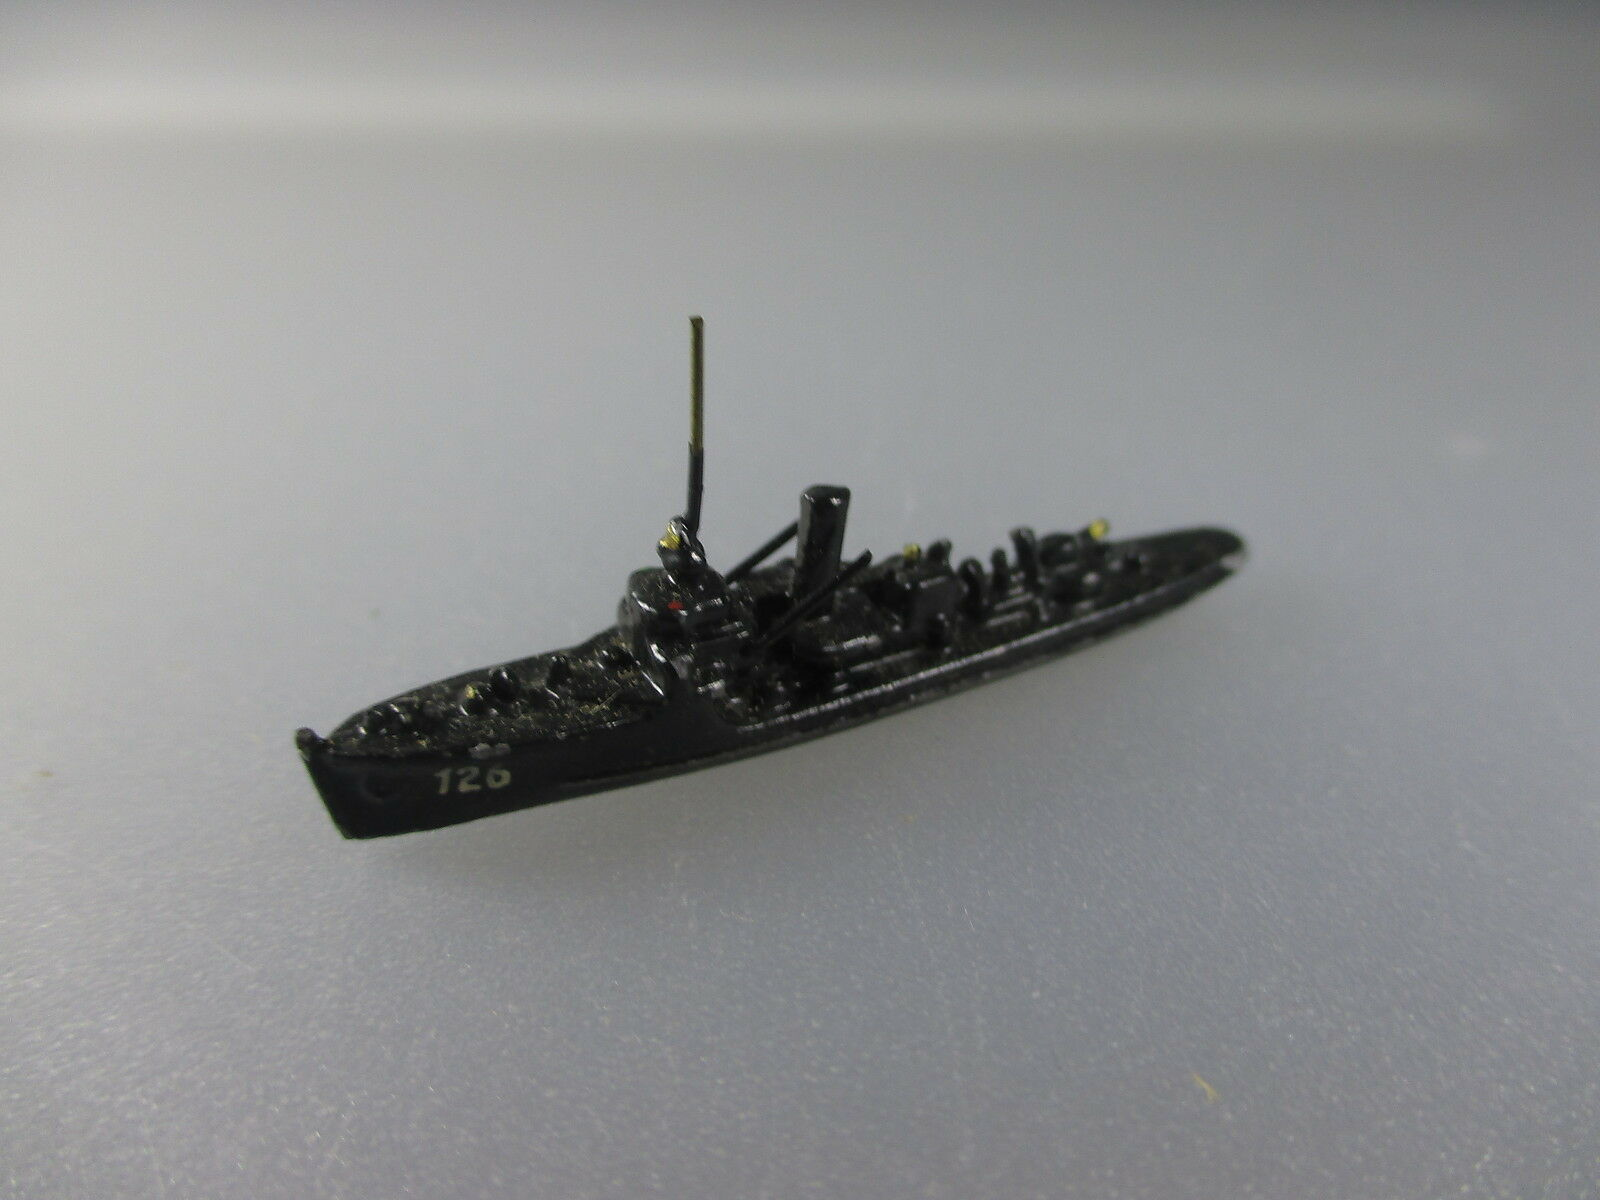 Wiking Wiking Wiking  minas-búsqueda Boot 126 tipo 1916 (nº 88k36) c5d288